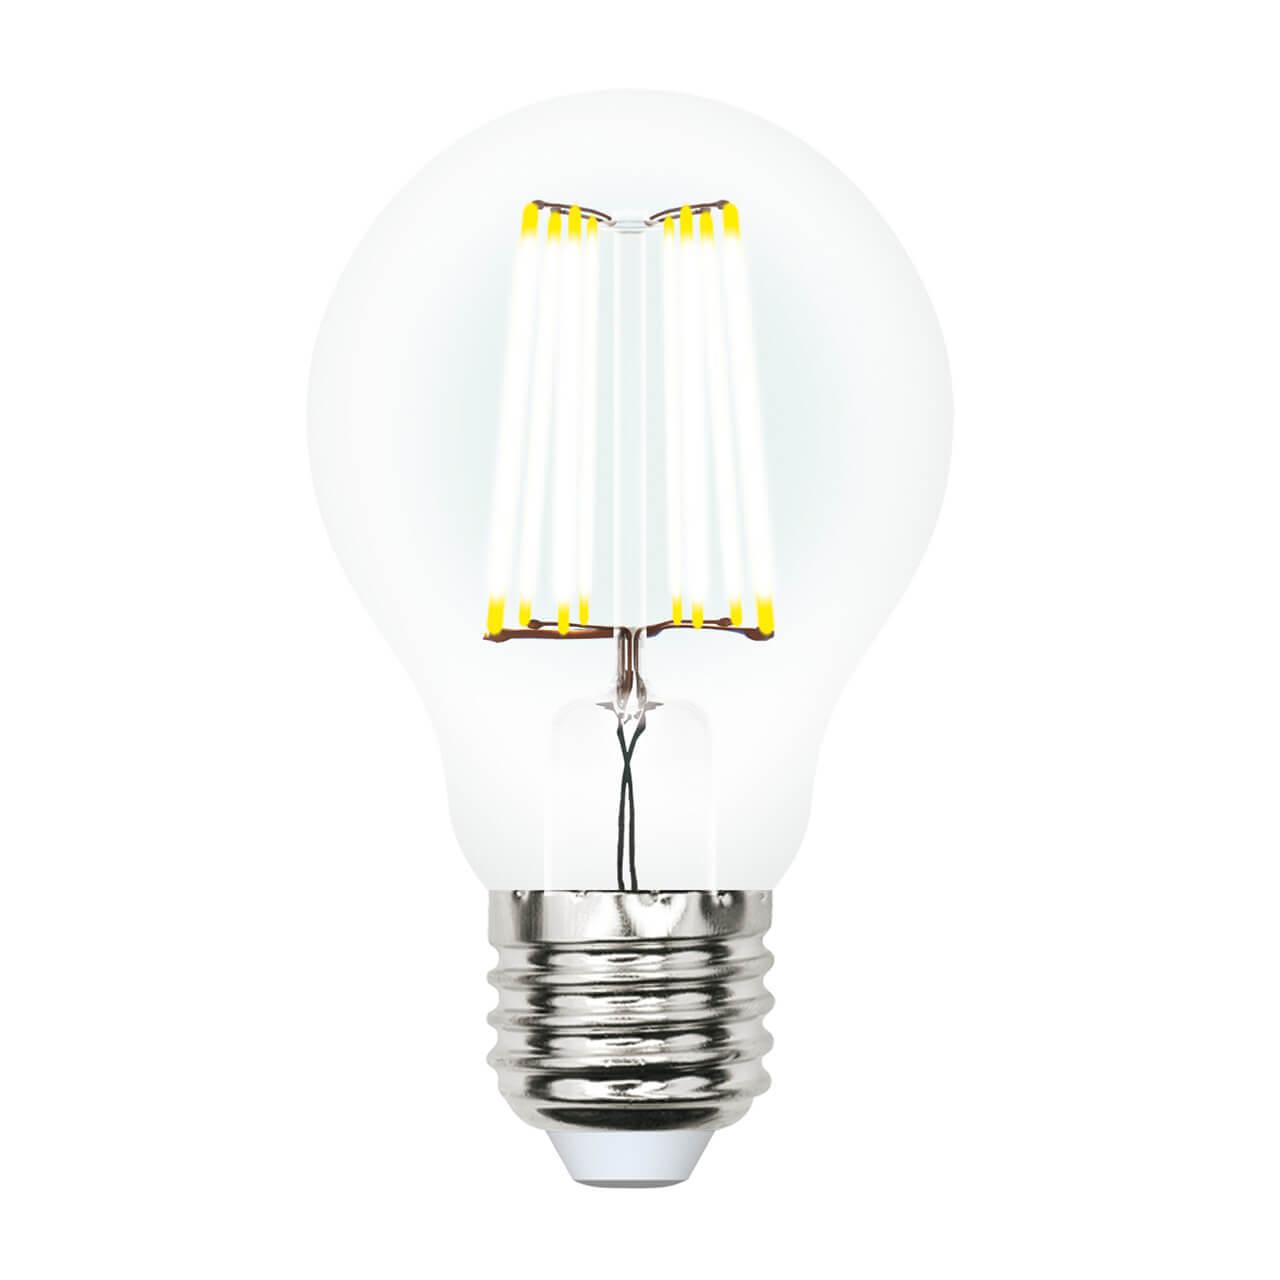 Лампа светодиодная филаментная (UL-00002626) Uniel E27 10W 4000K прозрачная LED-A60-10W/NW/E27/CL PLS02WH